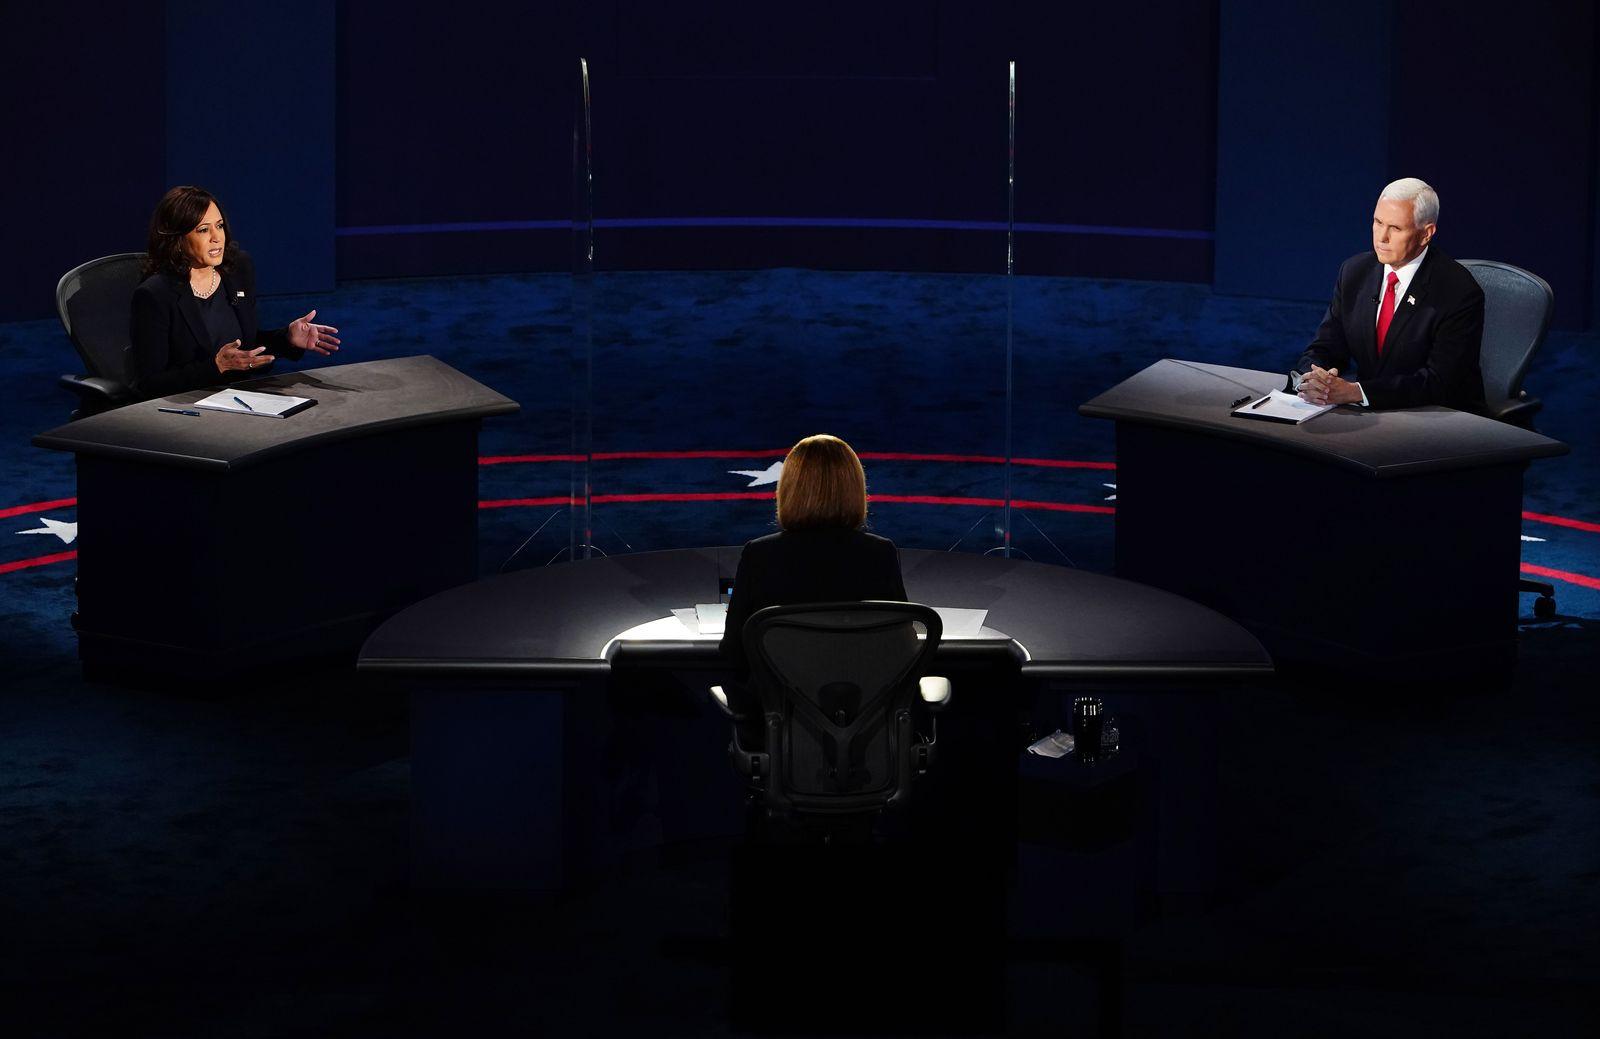 2020 Vice Presidential debate between US Vice President Mike Pence and Senator Kamala Harris, Salt Lake City, USA - 07 Oct 2020